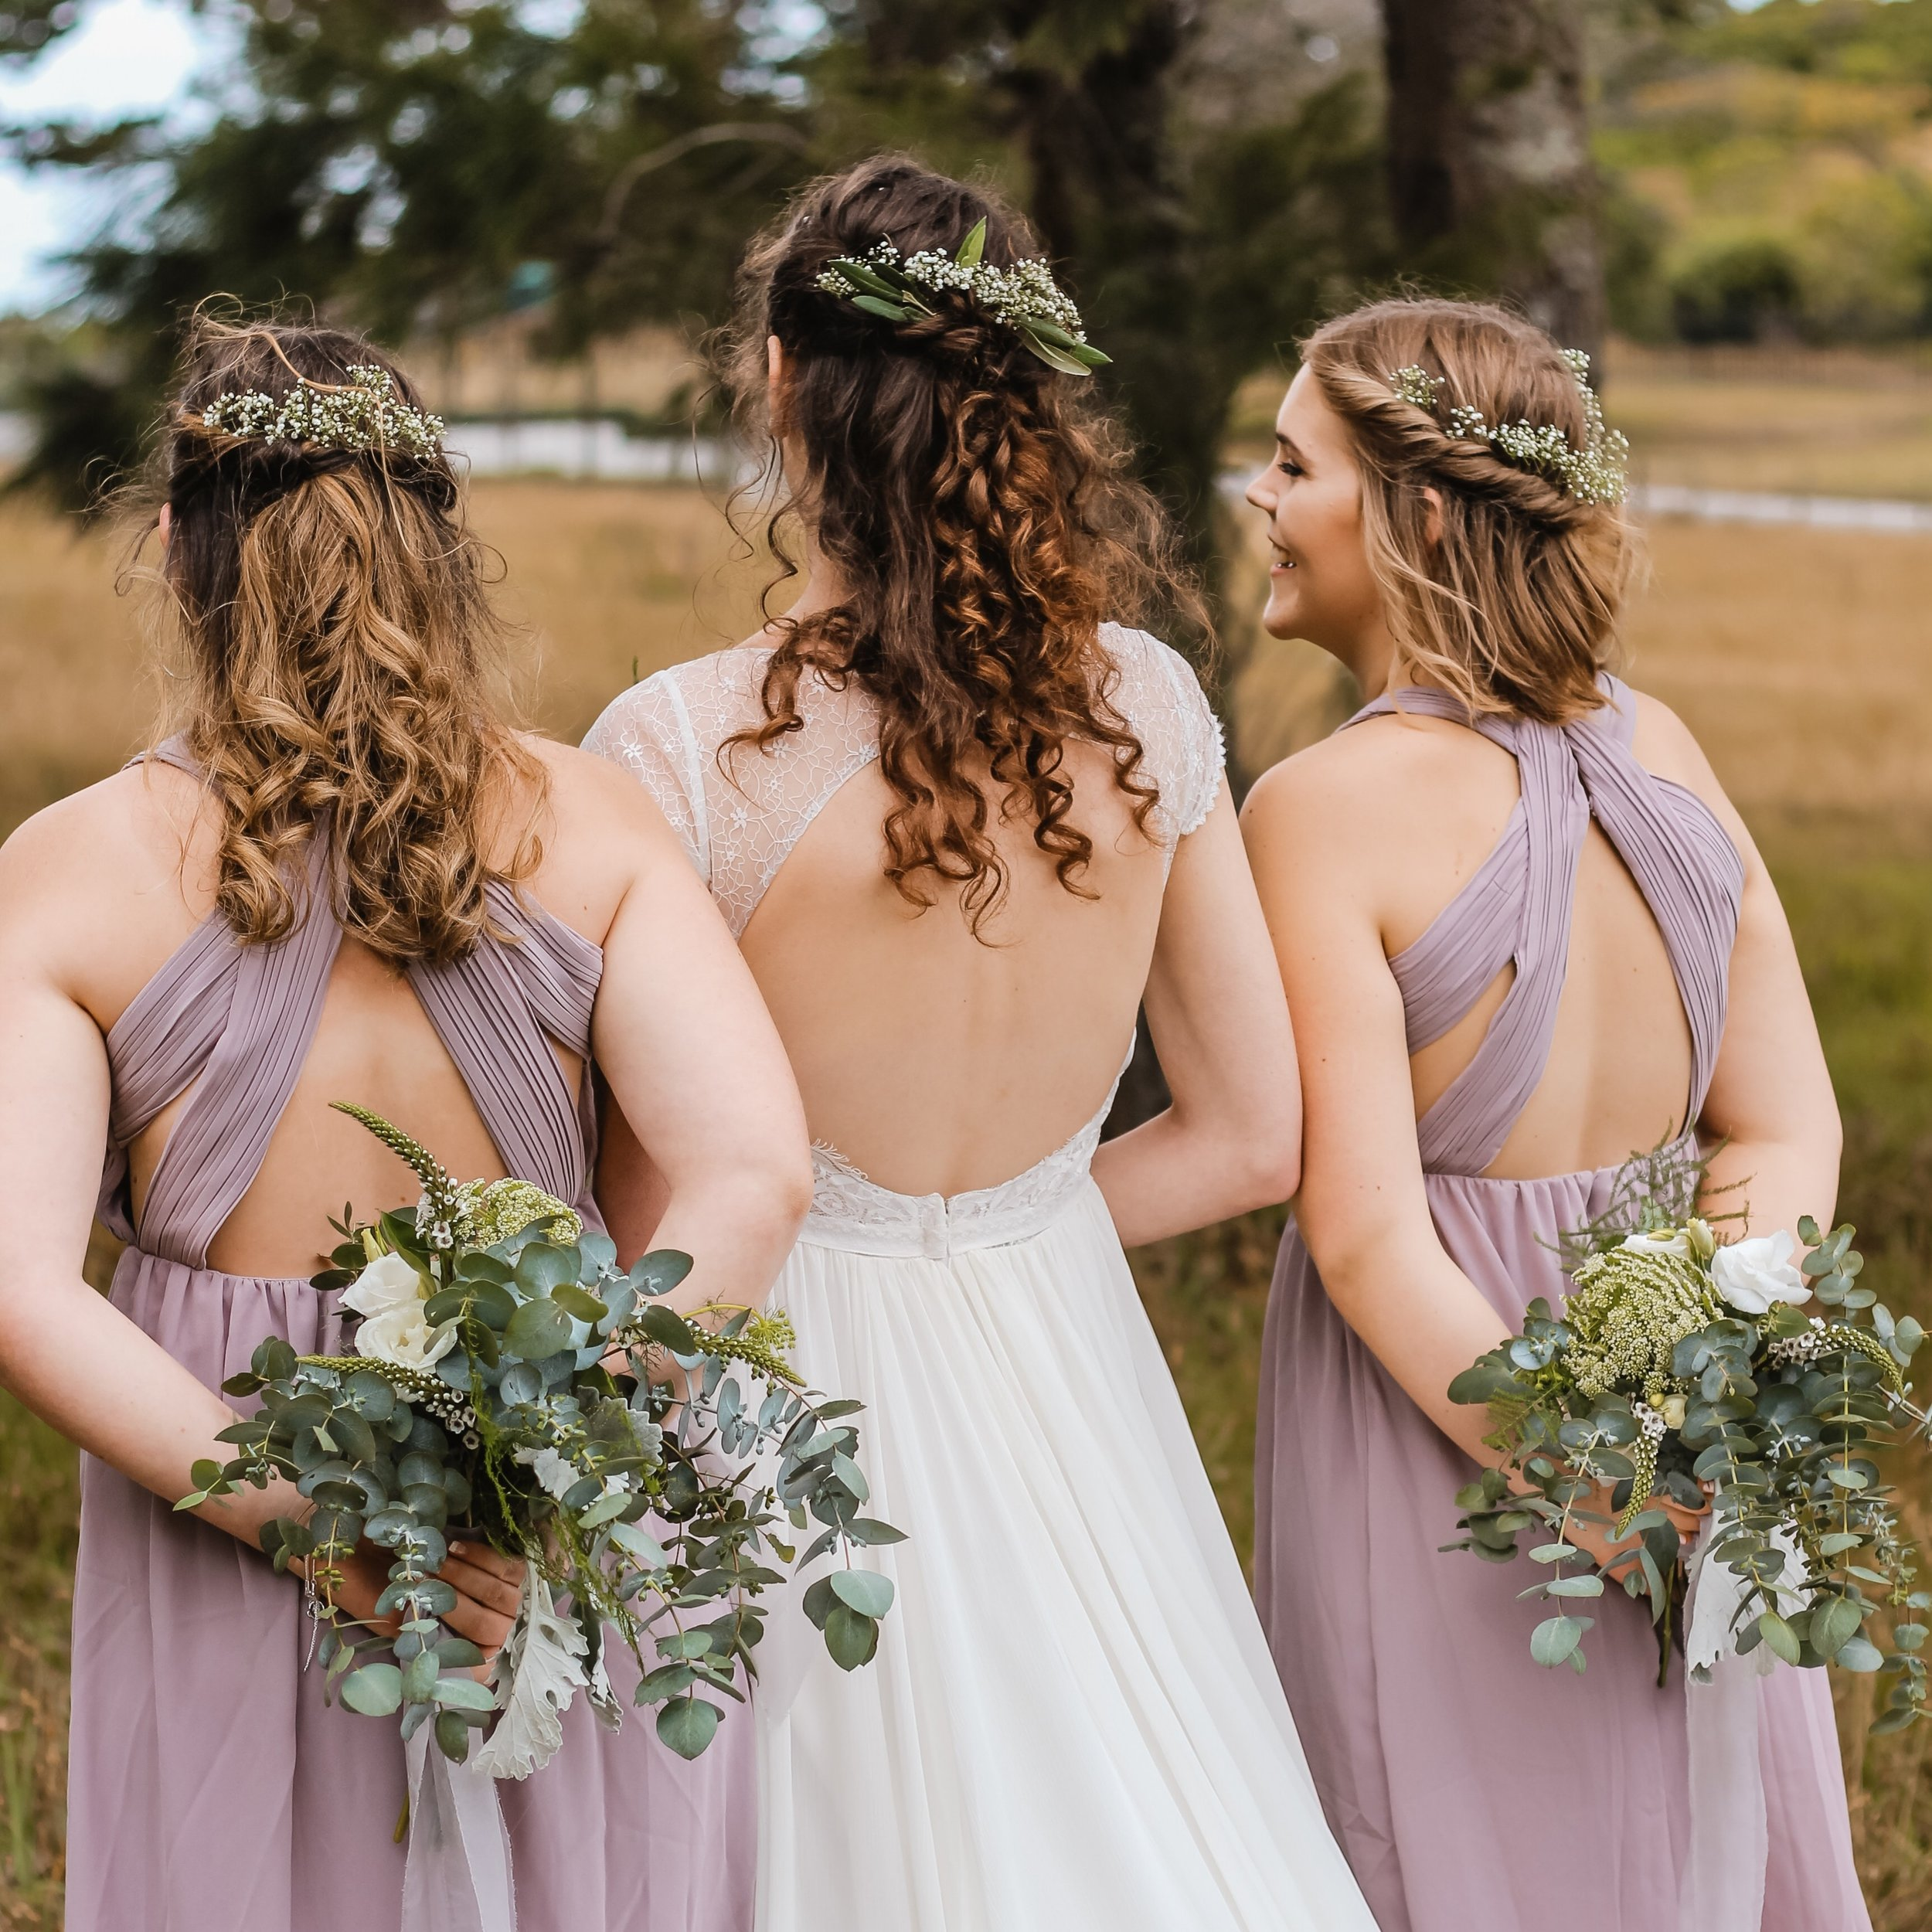 Bridesmaids Preserved Bouquet Jewellery